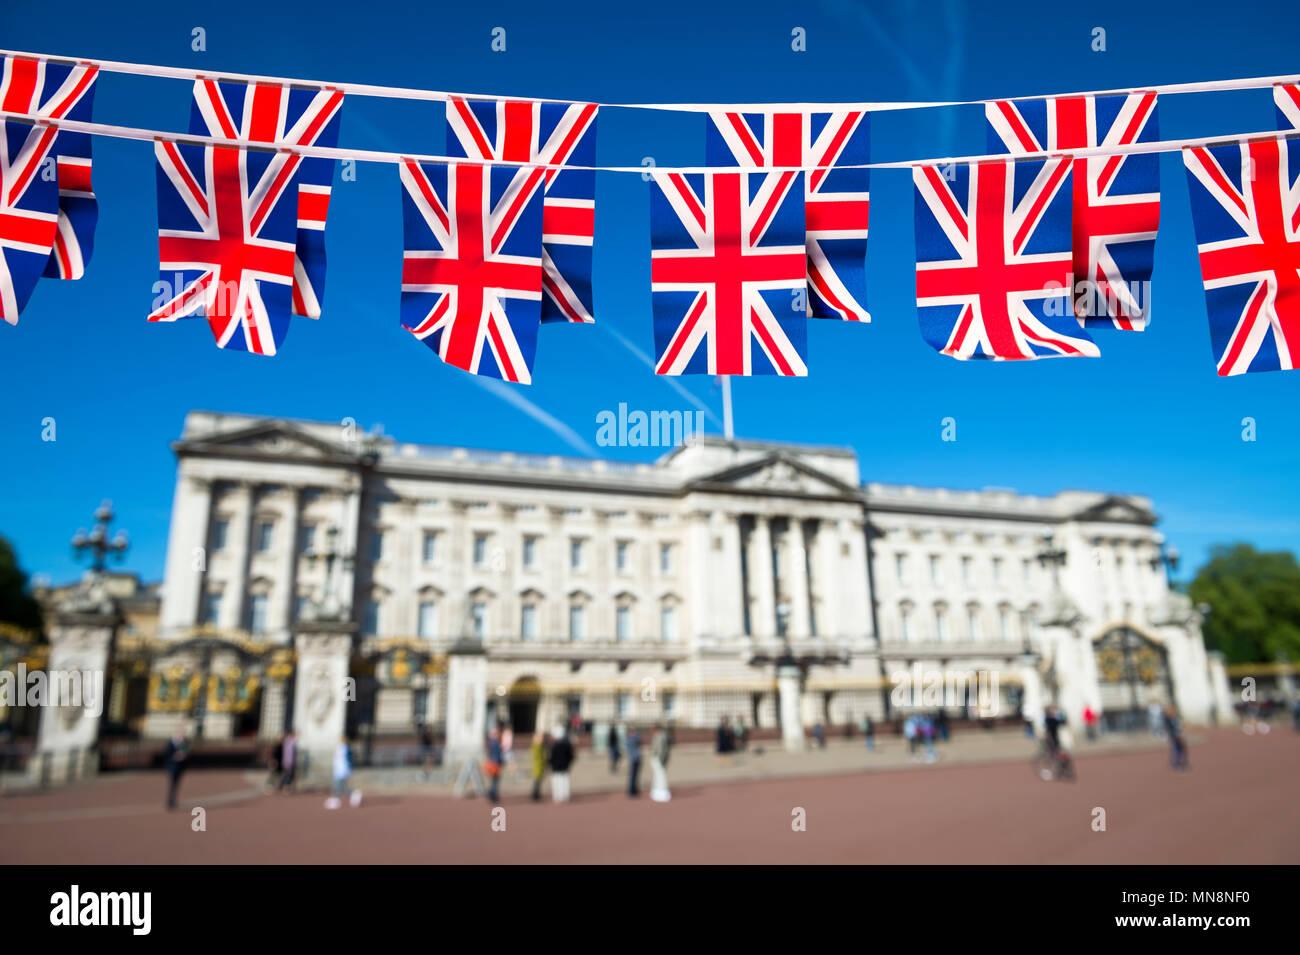 Union Jack flag bunting decora il centro commerciale di fronte a Buckingham Palace davanti al Royal Wedding a Londra, Inghilterra. Immagini Stock